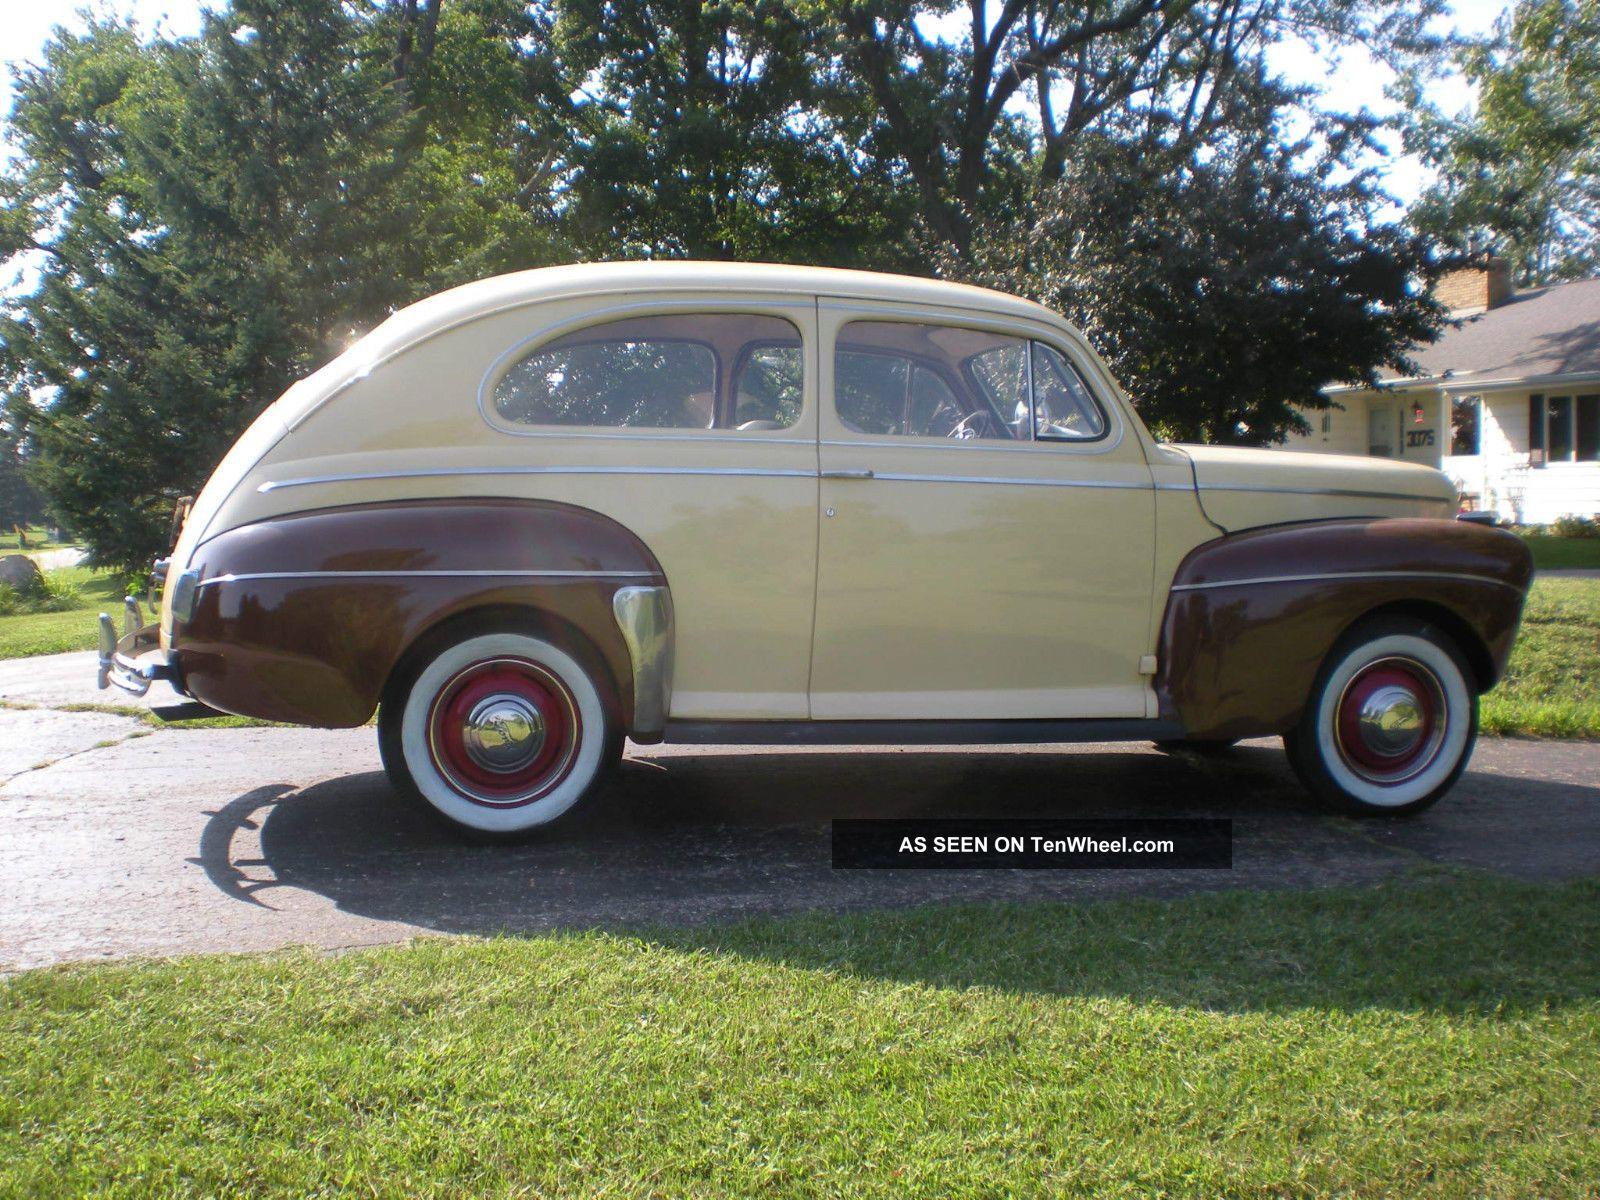 1941 Ford Deluxe 2 Door Sedan Flathead V8 Flatty Hot Rod Cruiser Plymouth 4 Potentiol